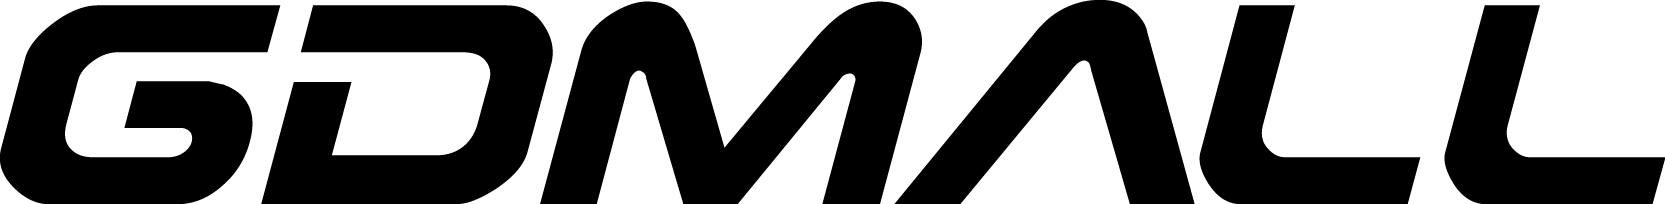 GDmall logo.png